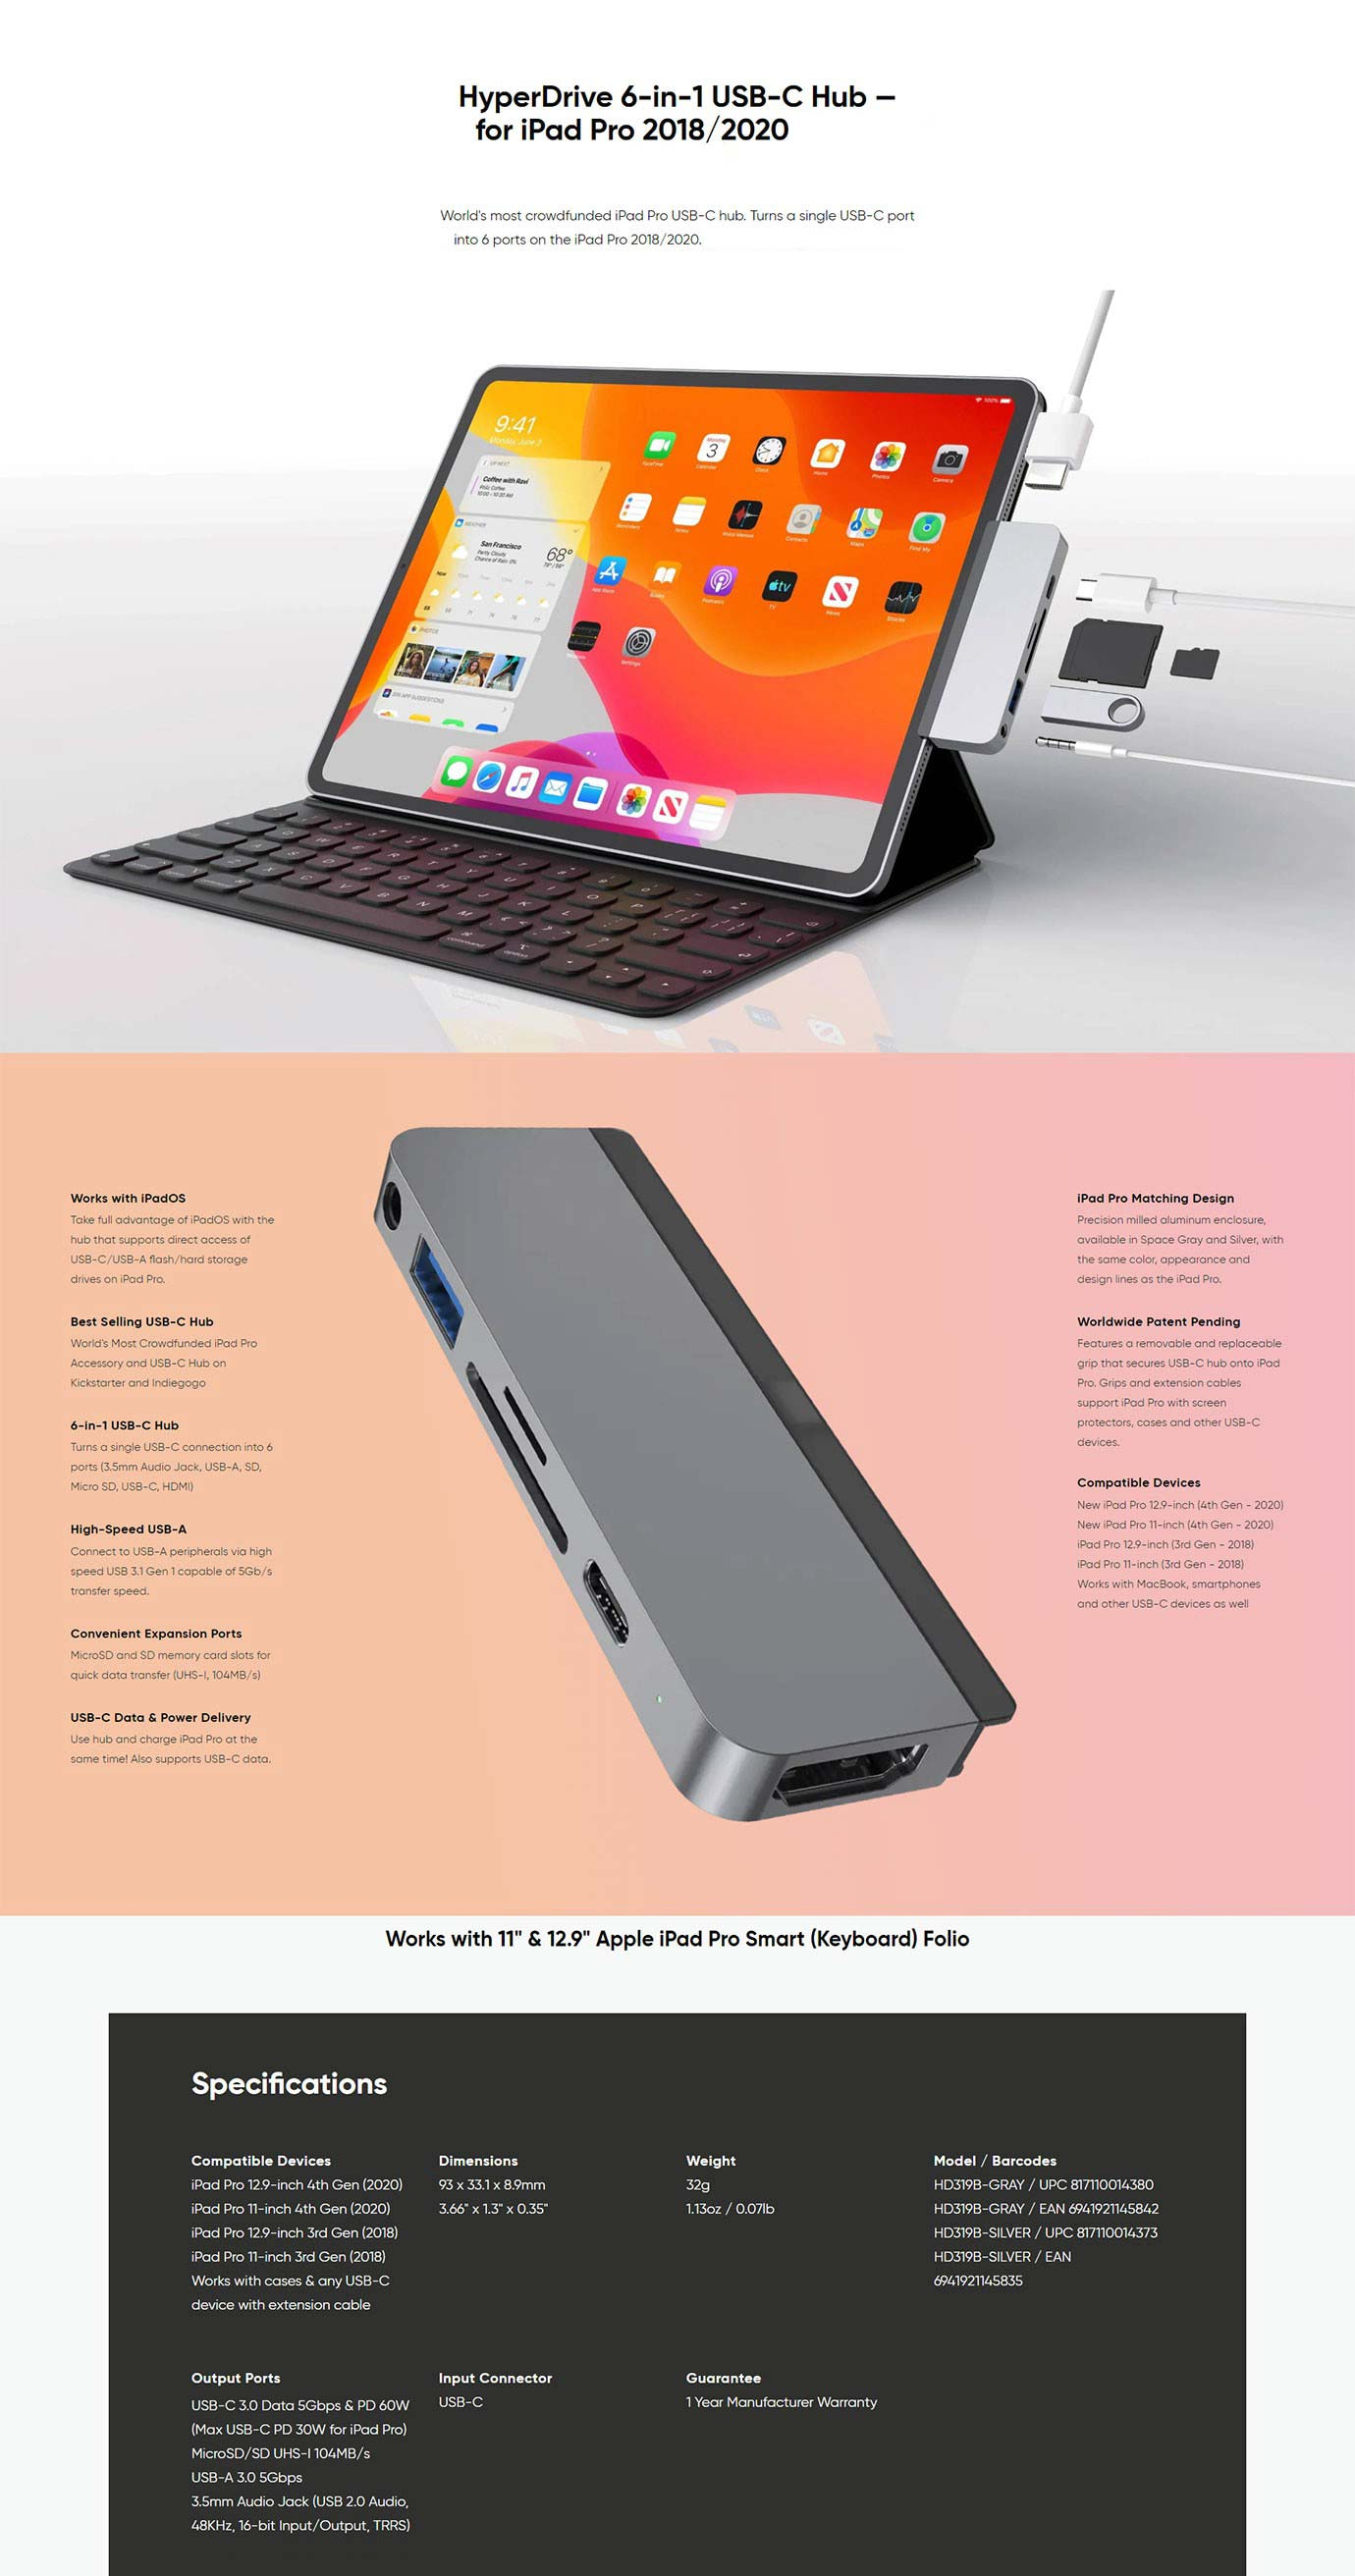 HyperDrive 6 Port USB-C Hub for iPad Pro